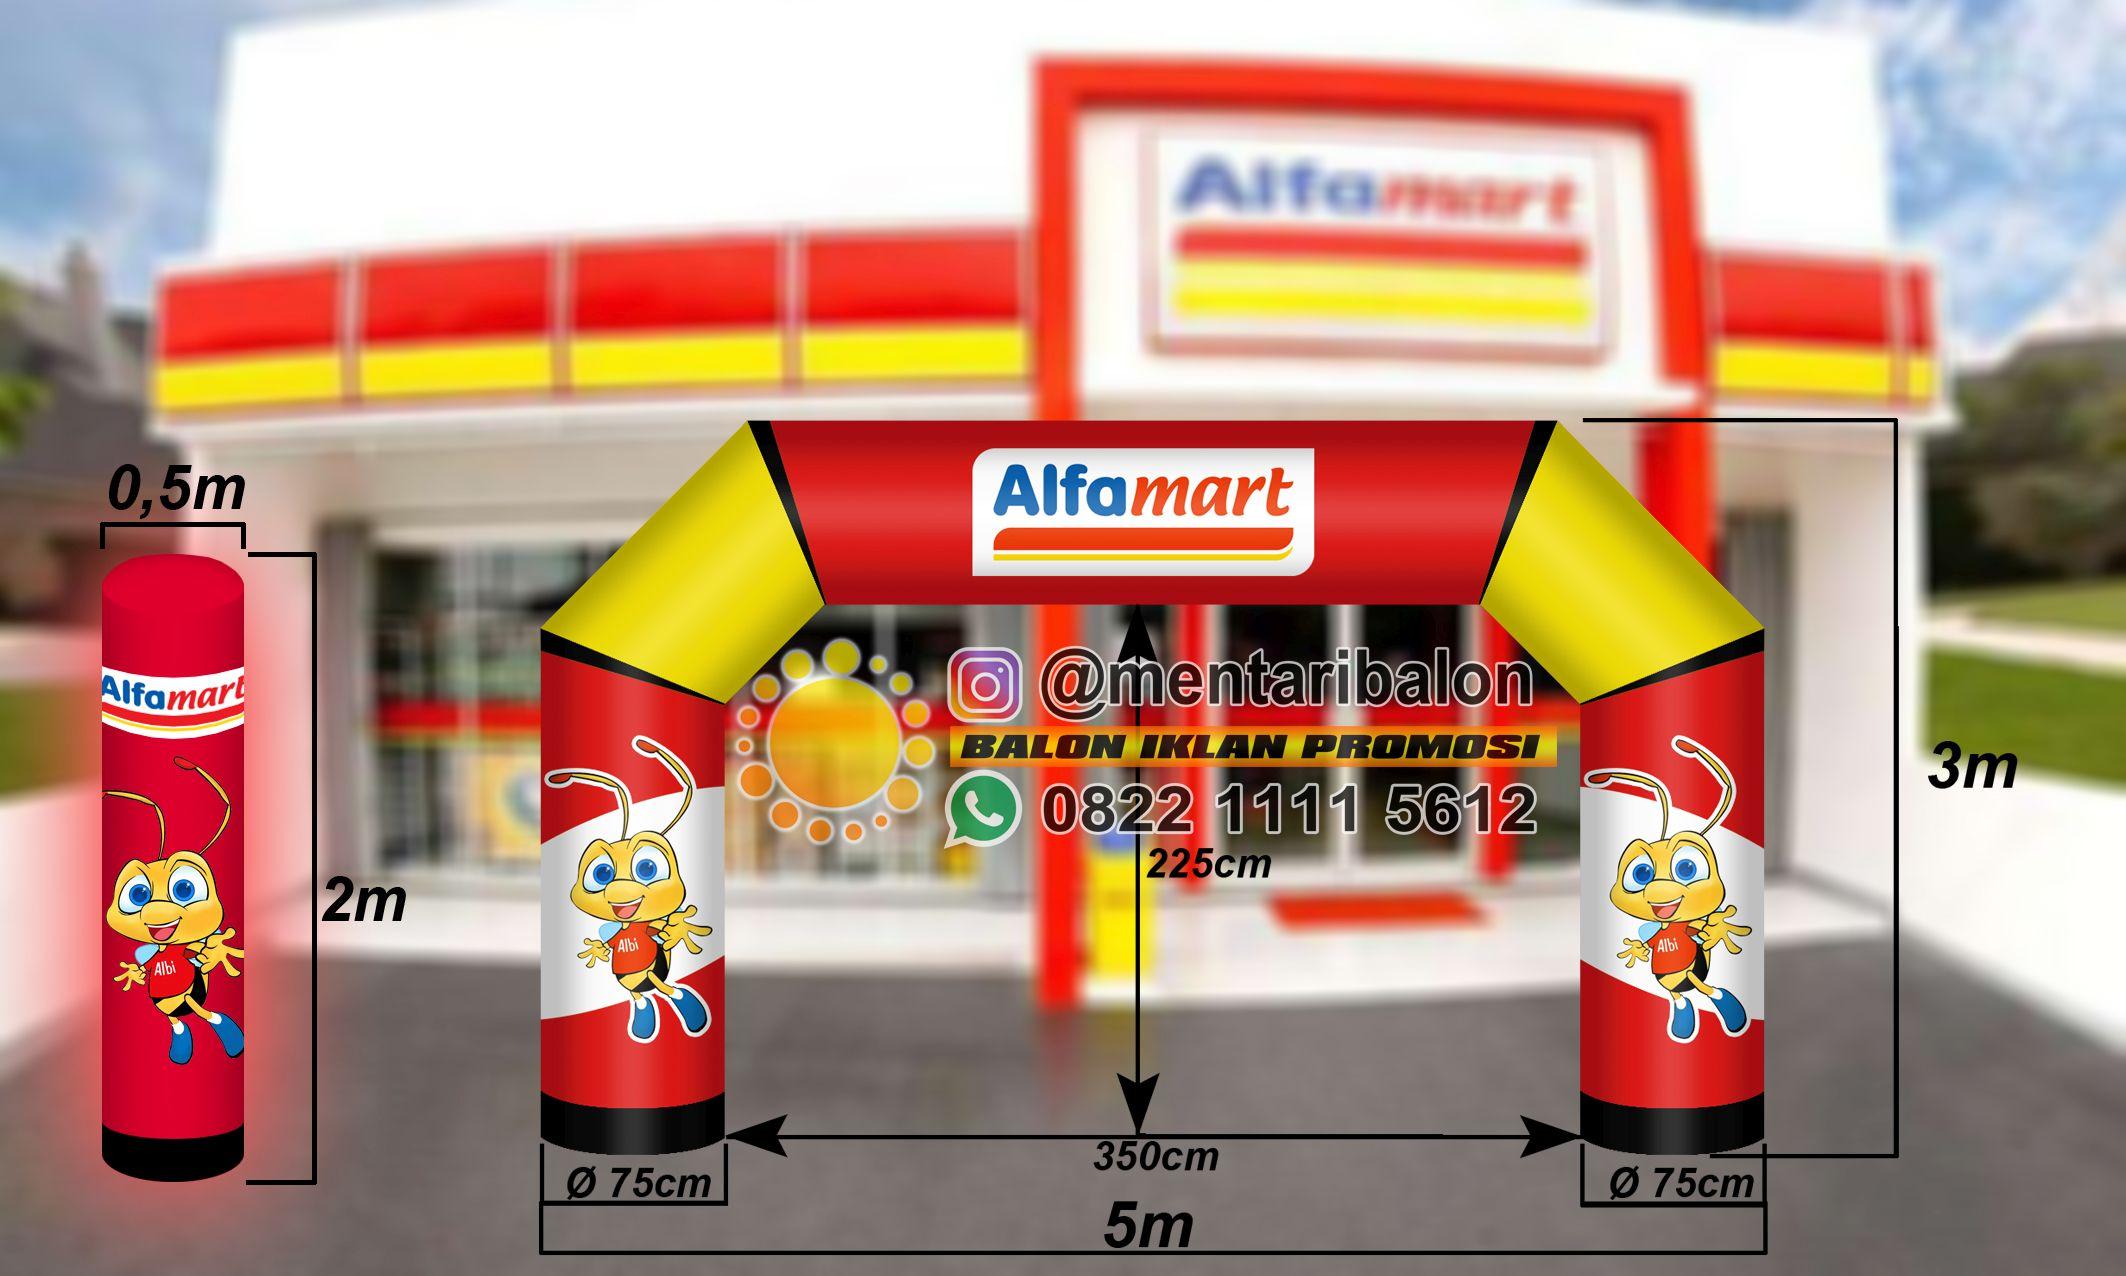 balon promosi alfamart